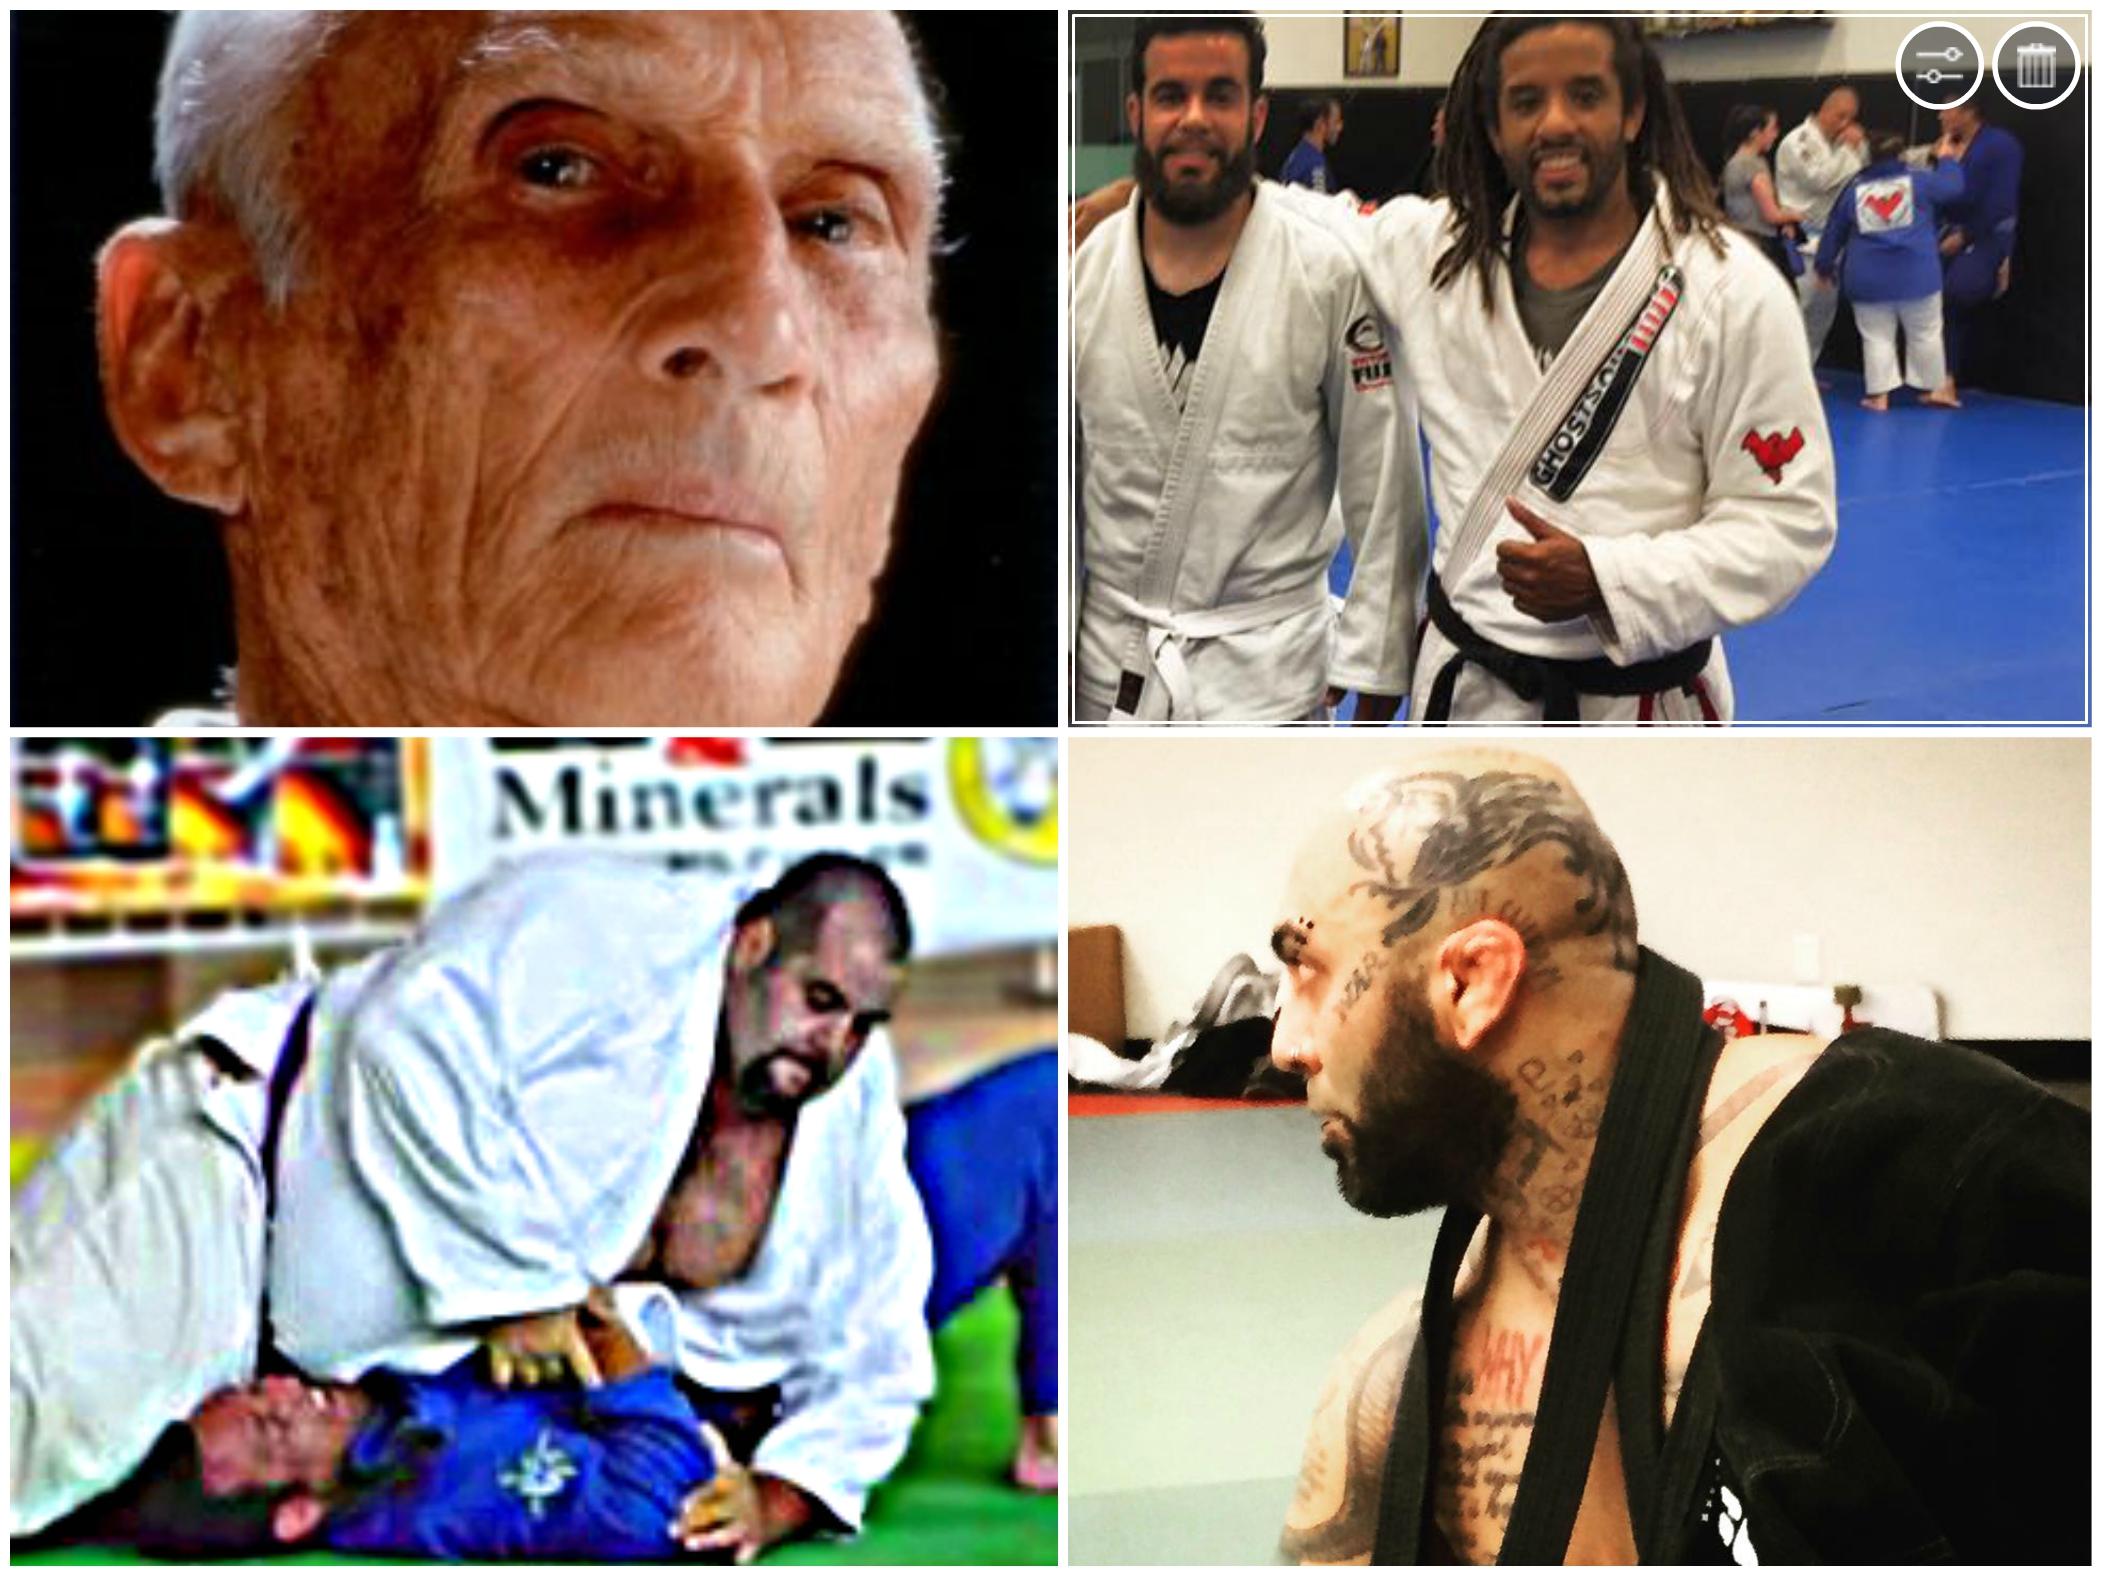 Helio Gracie Black Belt Standards: 'No Dreadlocks, Head Tattoos or being Overweight'